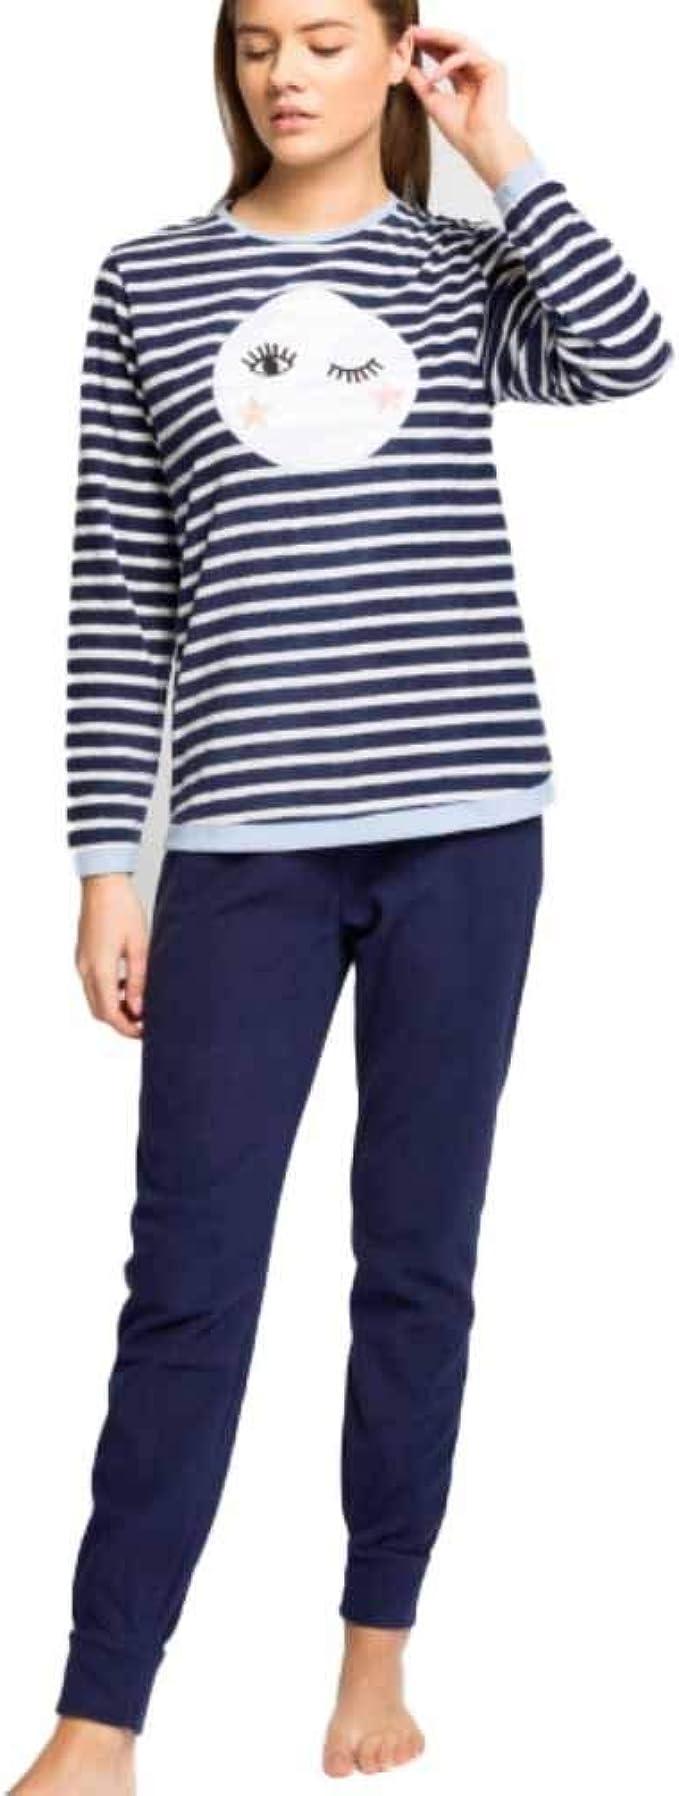 GISELA Pijama de Mujer Micropolar 2/1618 - Azul, S: Amazon.es ...